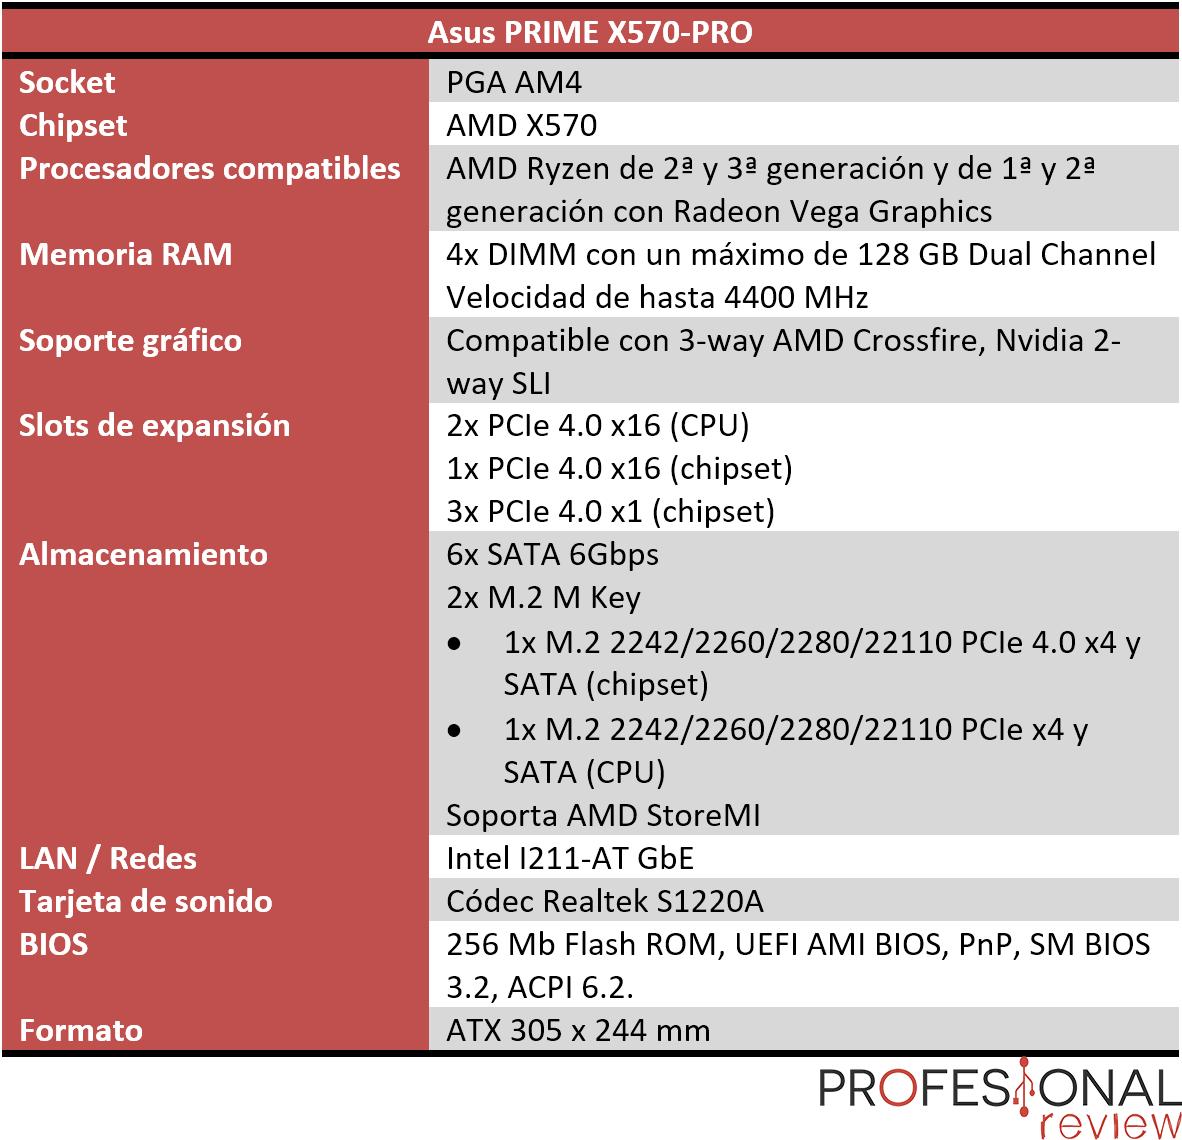 Asus PRIME X570-PRO características